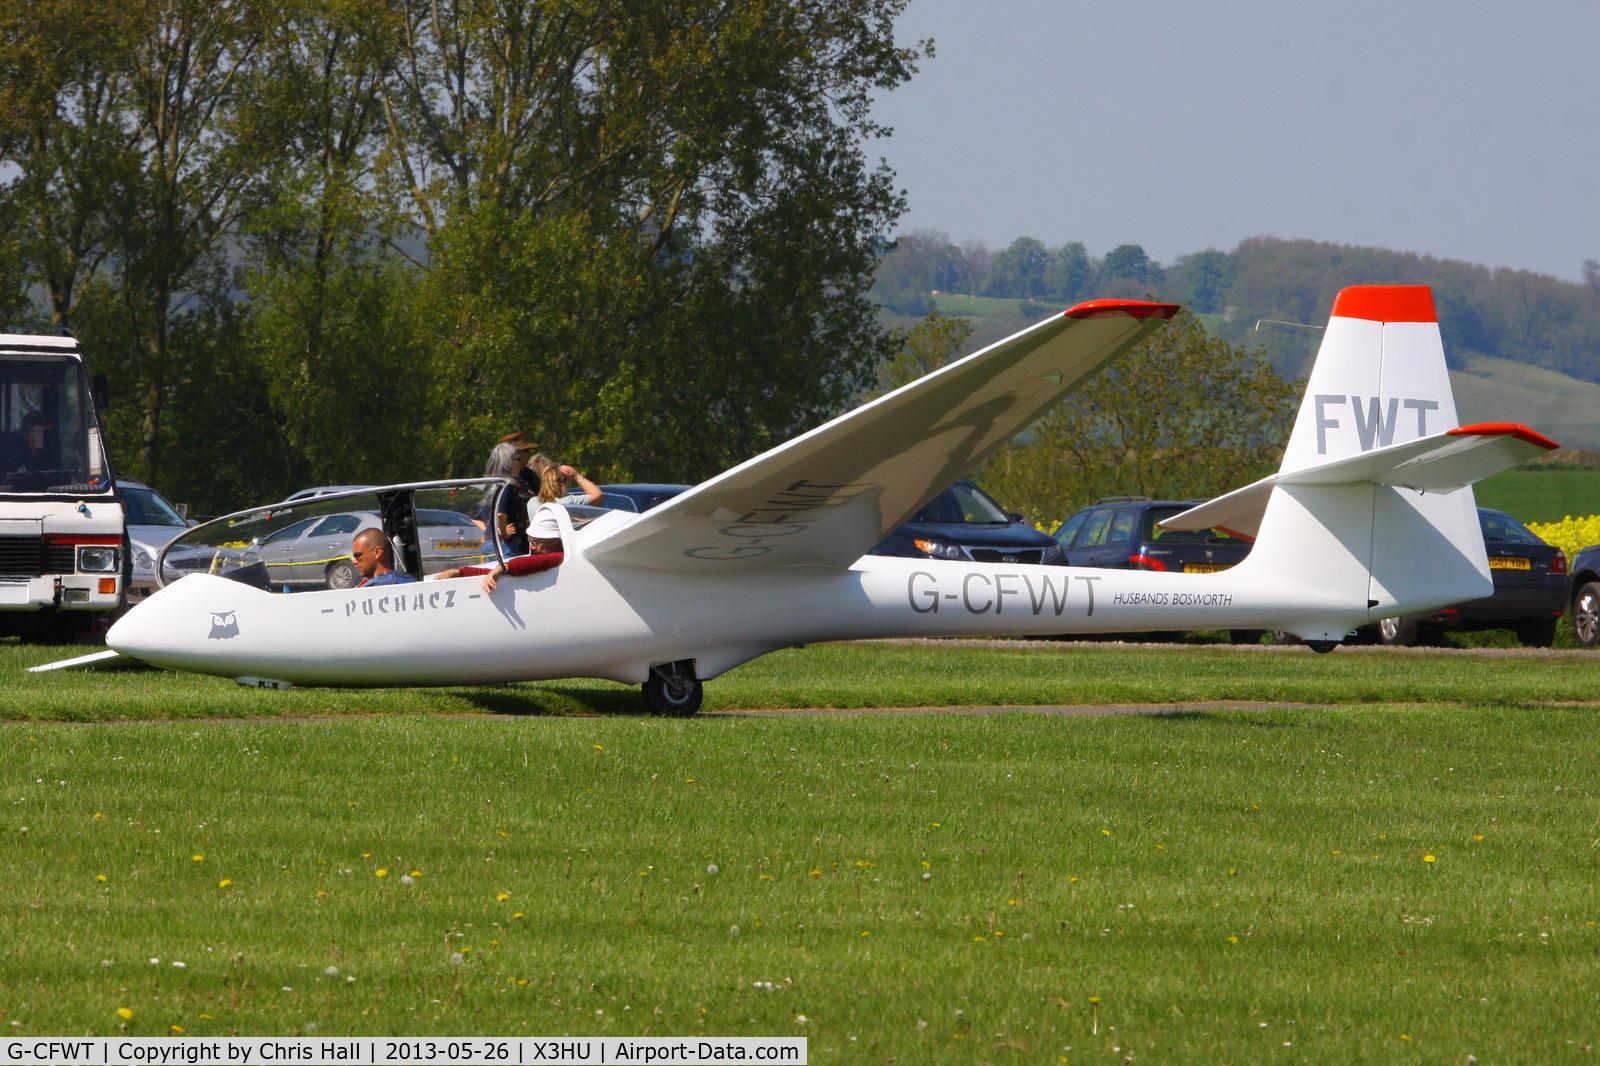 G-CFWT, 1990 PZL-Bielsko SZD-50-3 Puchacz C/N B-1988, Coventry Gliding Club, Husbands Bosworth